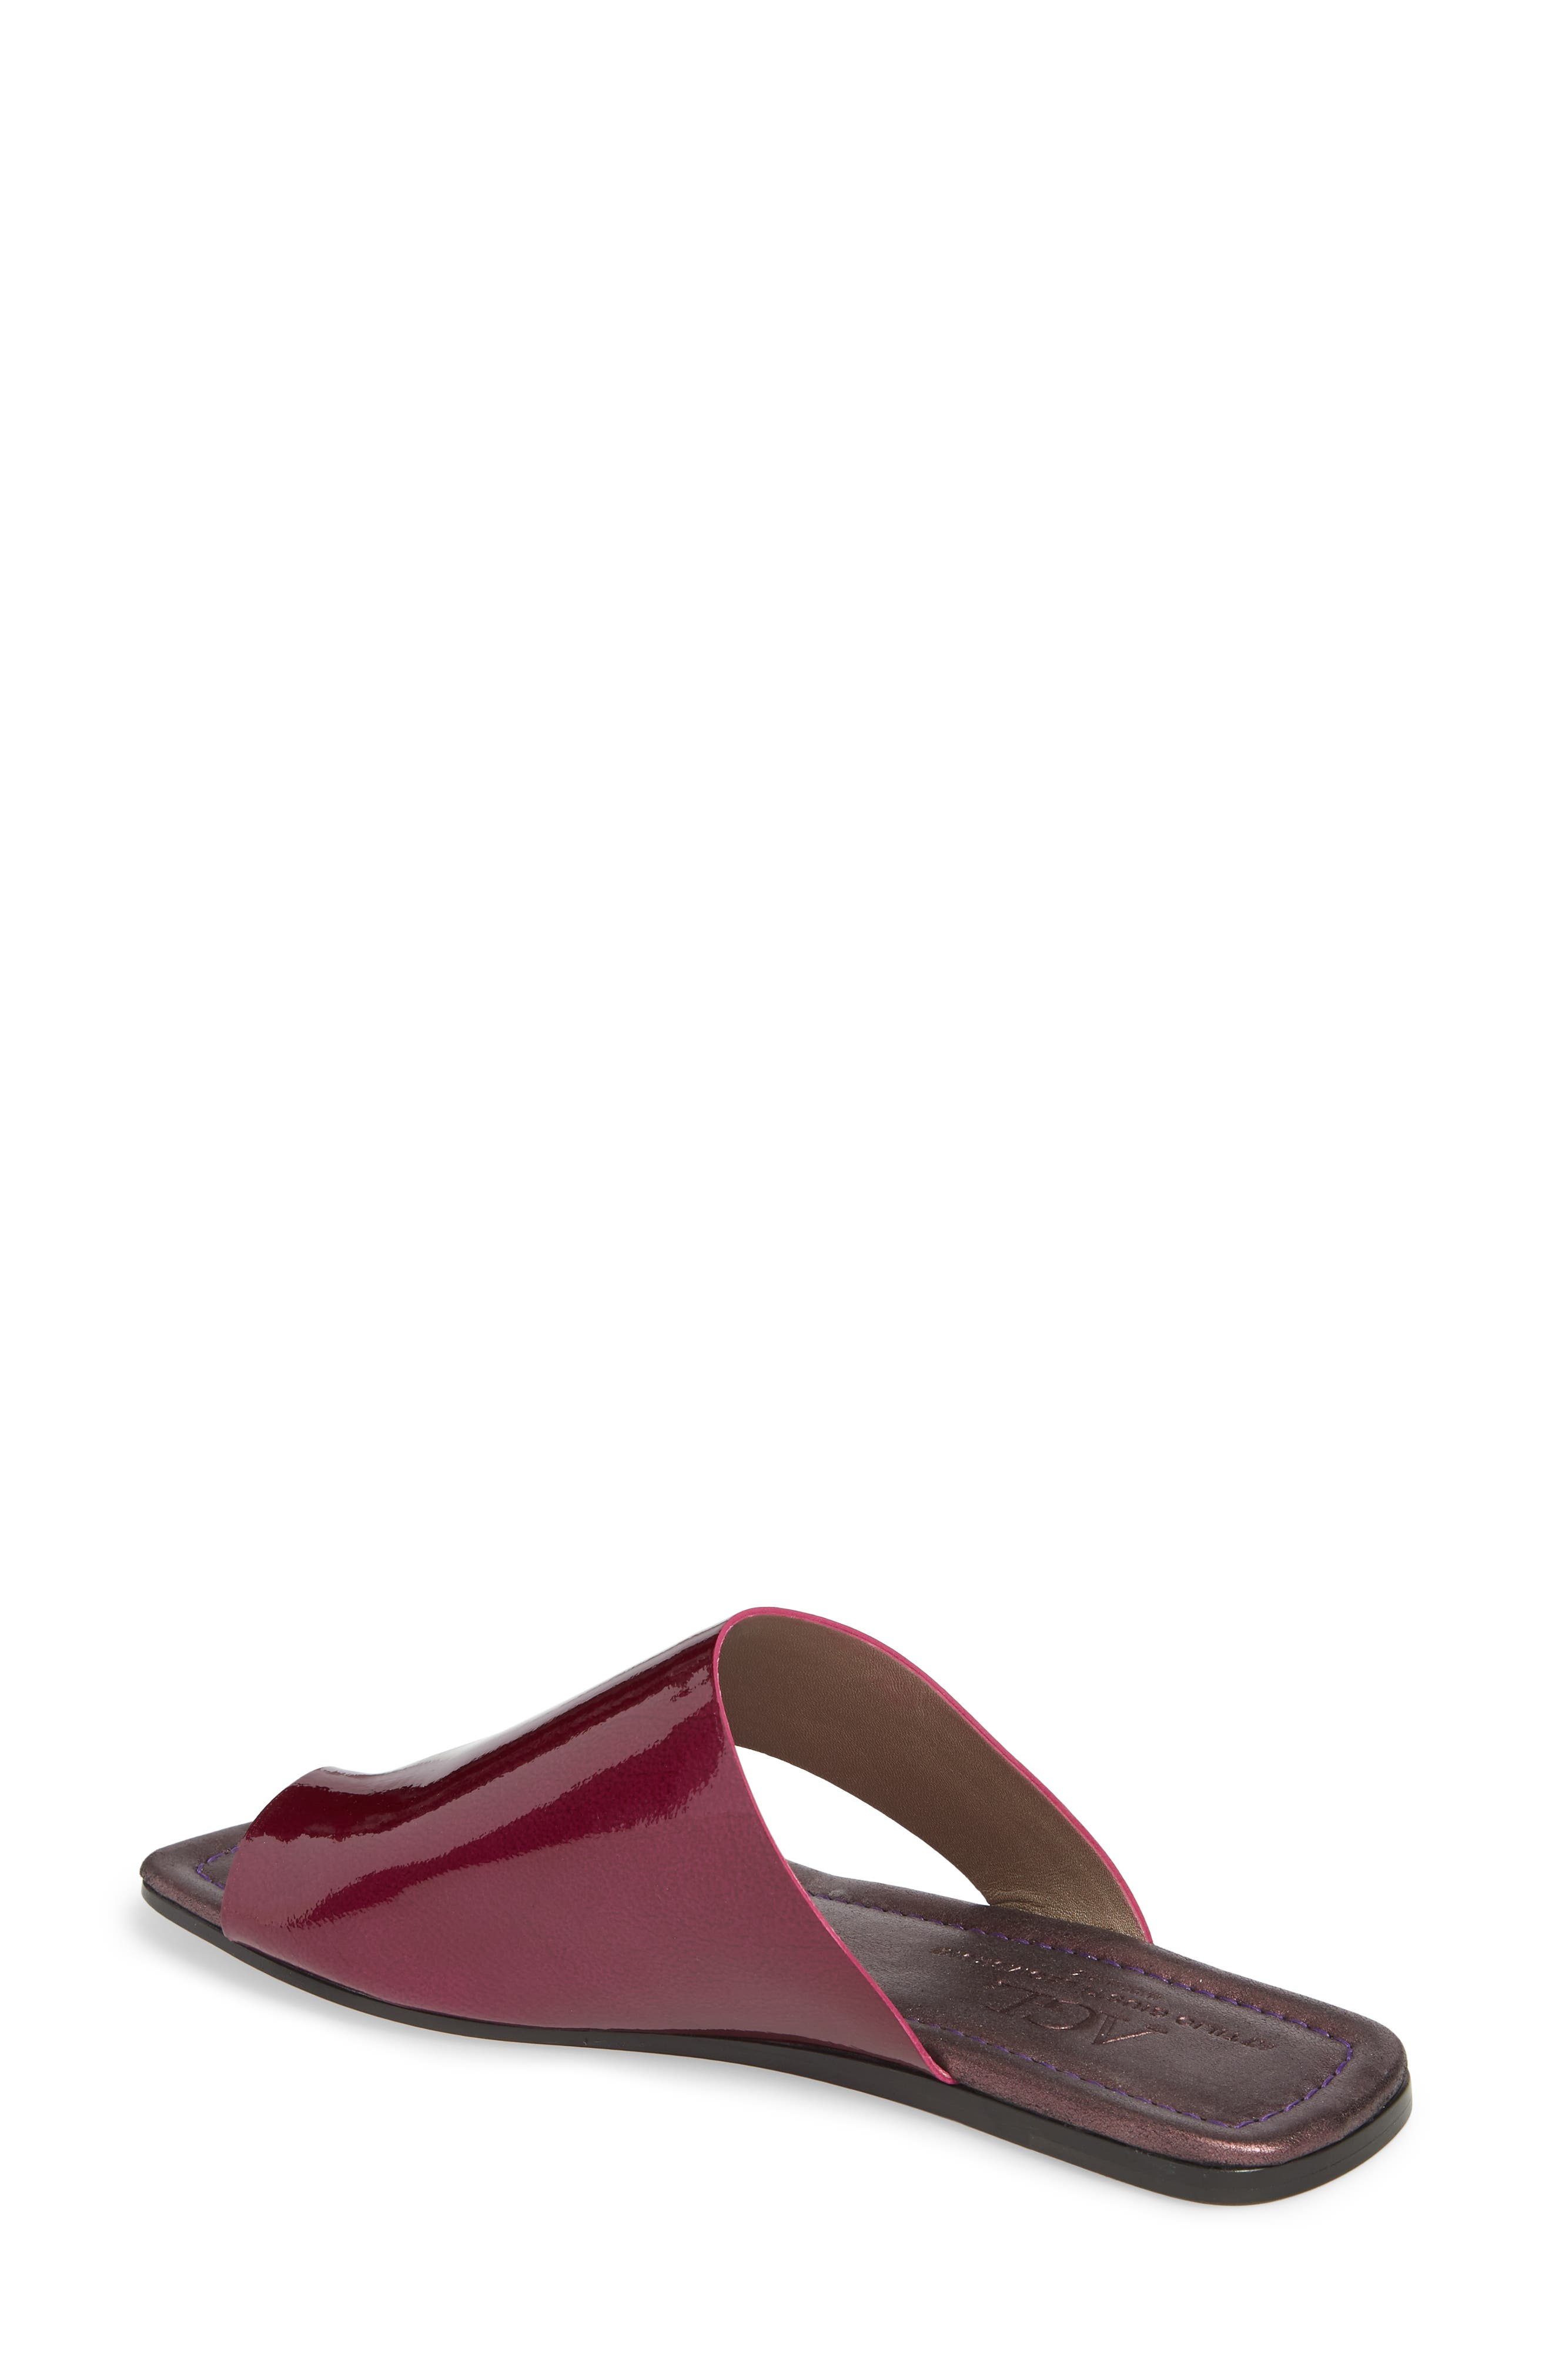 Asymmetrical Toe Thong Sandal,                             Alternate thumbnail 2, color,                             Fuchsia Patent